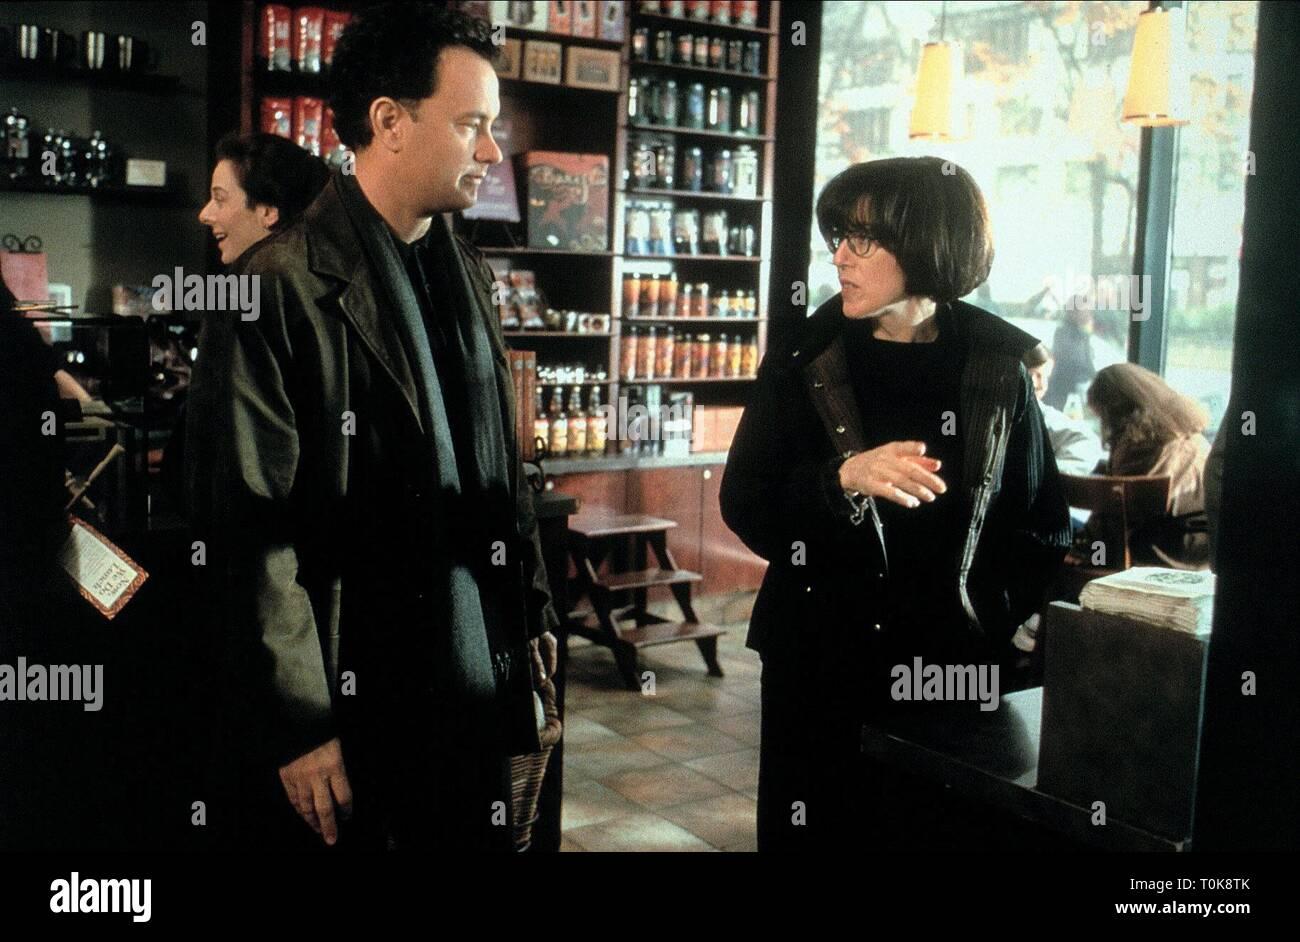 Tom Hanks Nora Ephron You Ve Got Mail 1998 Stock Photo Alamy